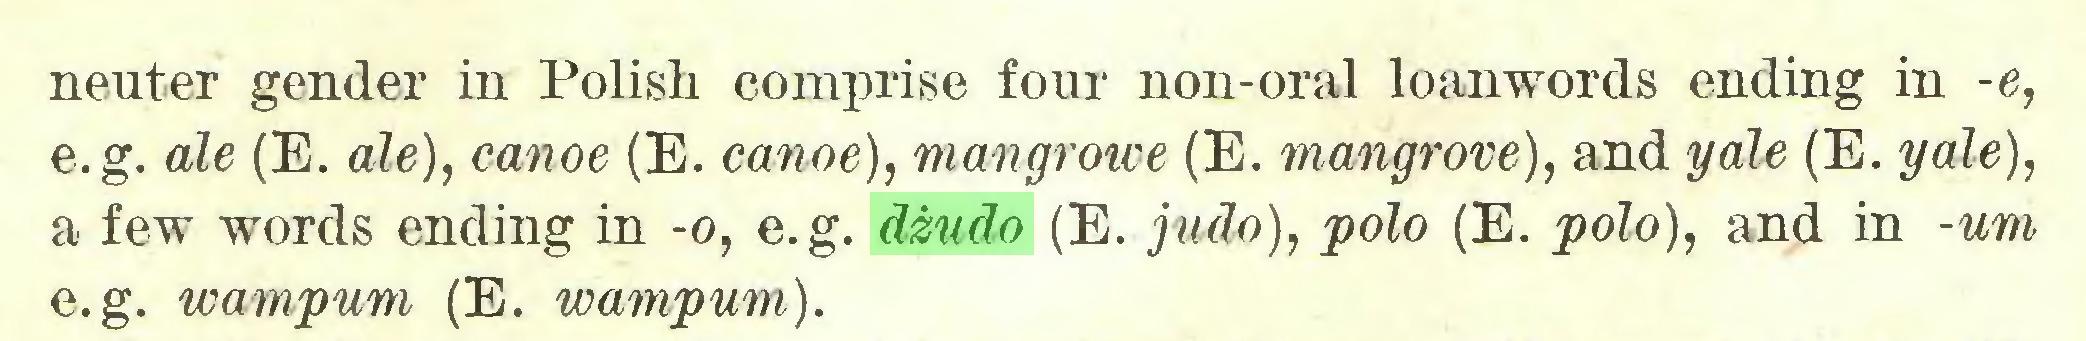 (...) neuter gender in Polish comprise four non-oral loanwords ending in -e, e.g. ale (E. ale), canoe (E. canoe), mangrowe (E. mangrove), and yale (E. yale), a few words ending in -o, e.g. dżudo (E. judo), polo (E. polo), and in -um e.g. wampum (E. wampum)...